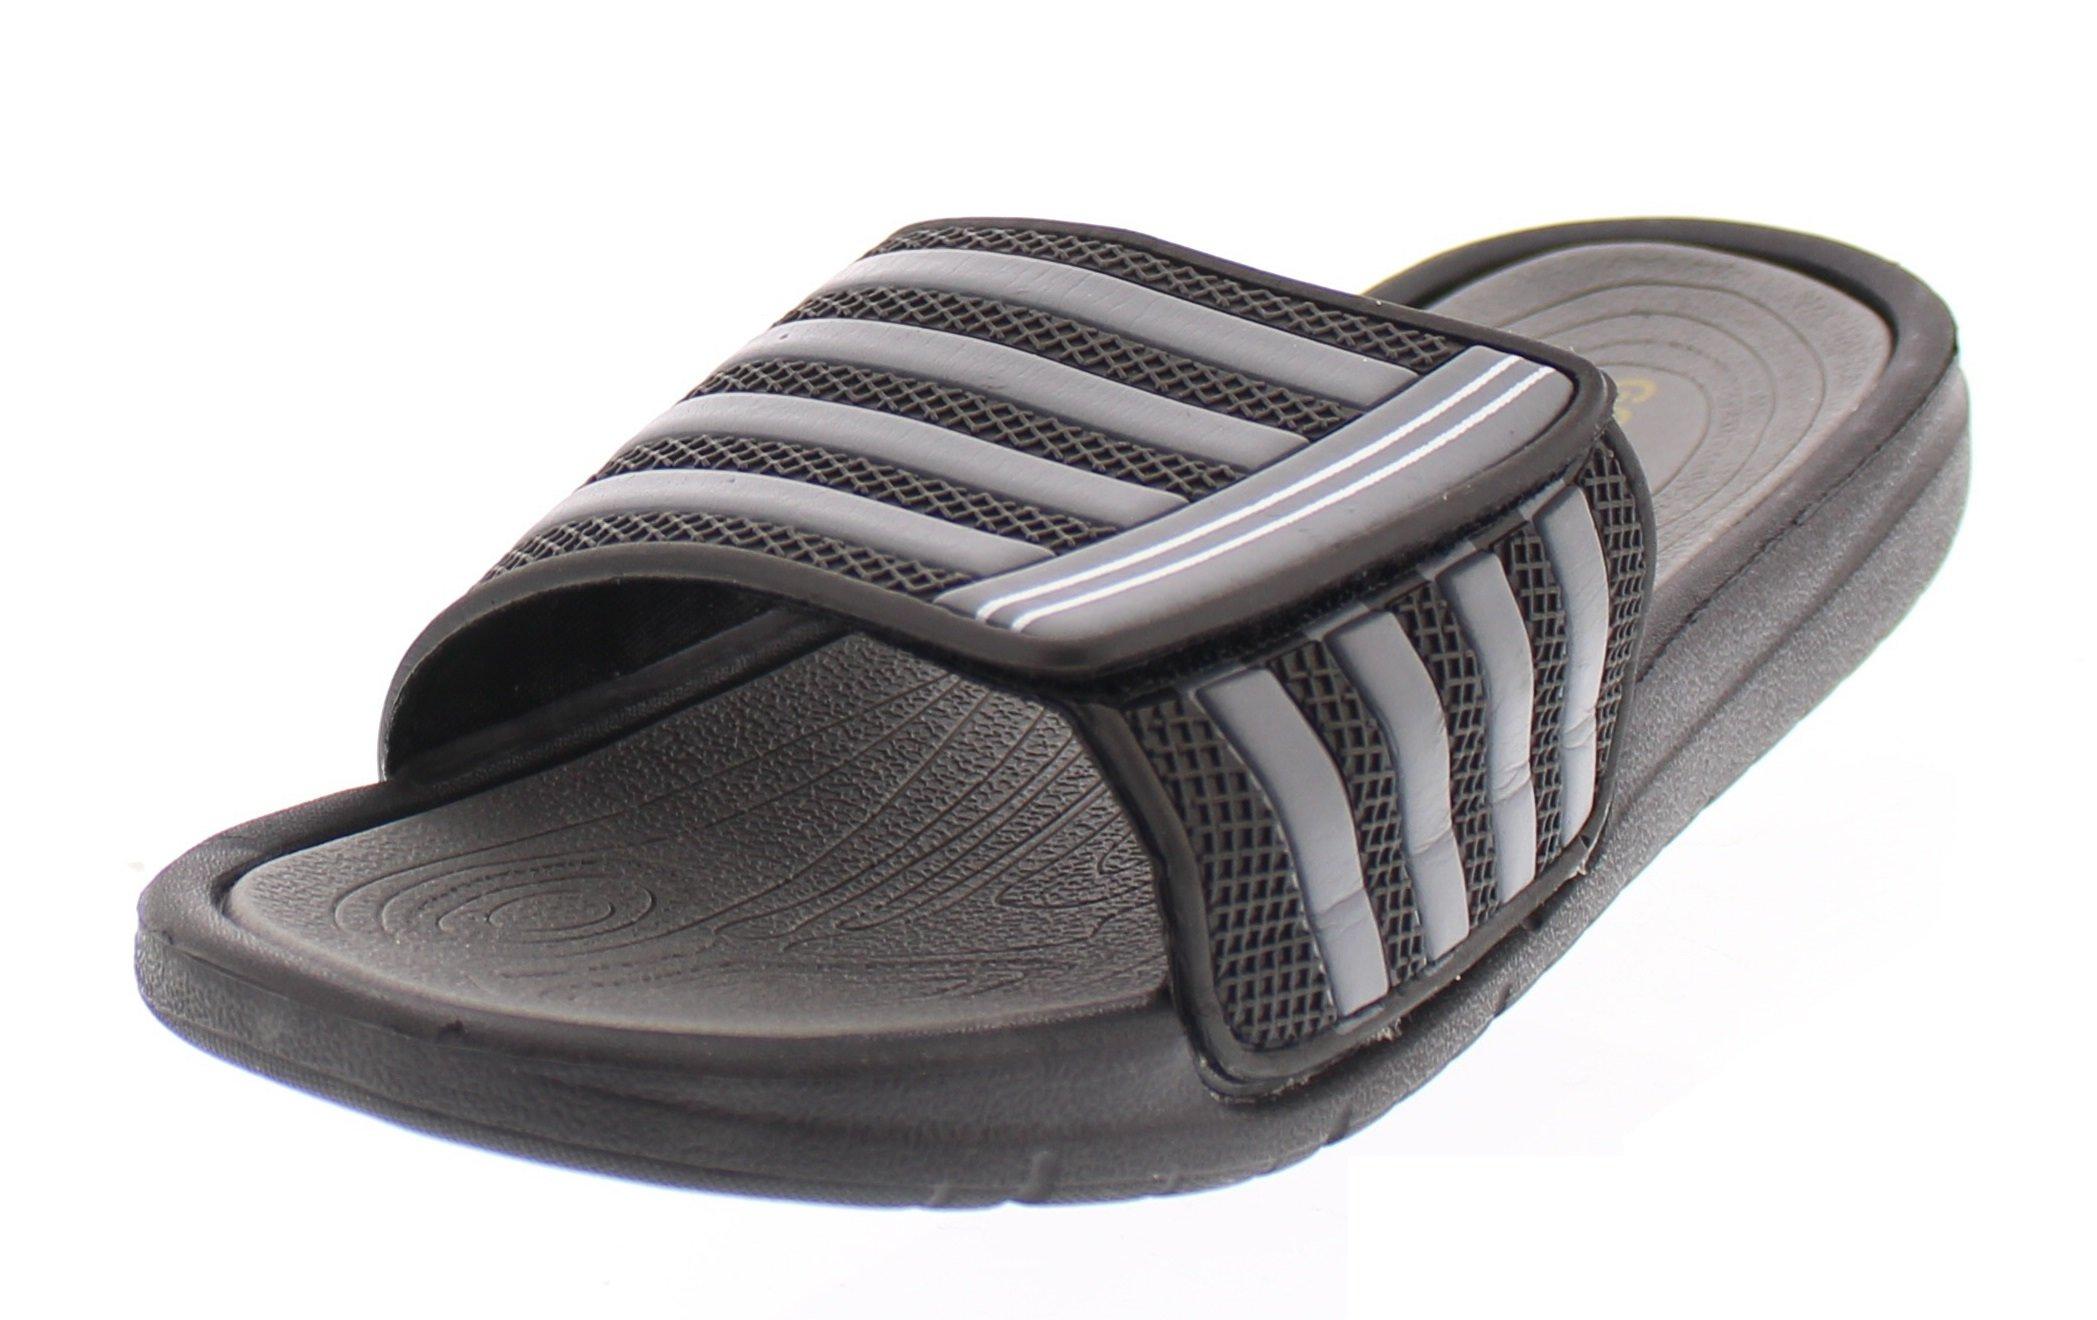 Gold Toe Men's James Athletic Stripe Adjustable Slide Sandals Casual Open Toe Casual Summer Slipper Shoes Black 9.5D US